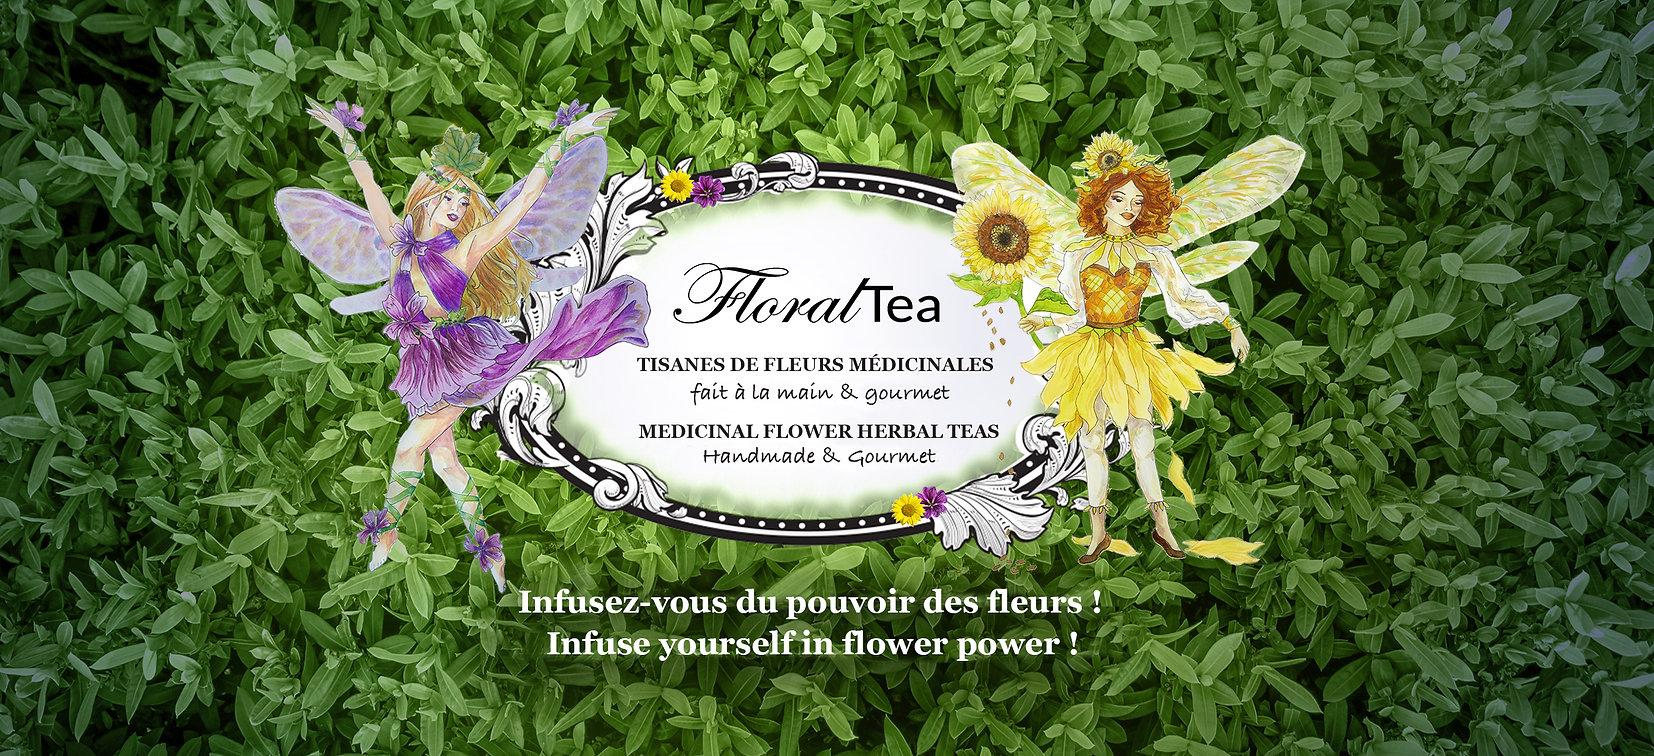 FloralTea Handmade Medicinal Flower Herbal Teas